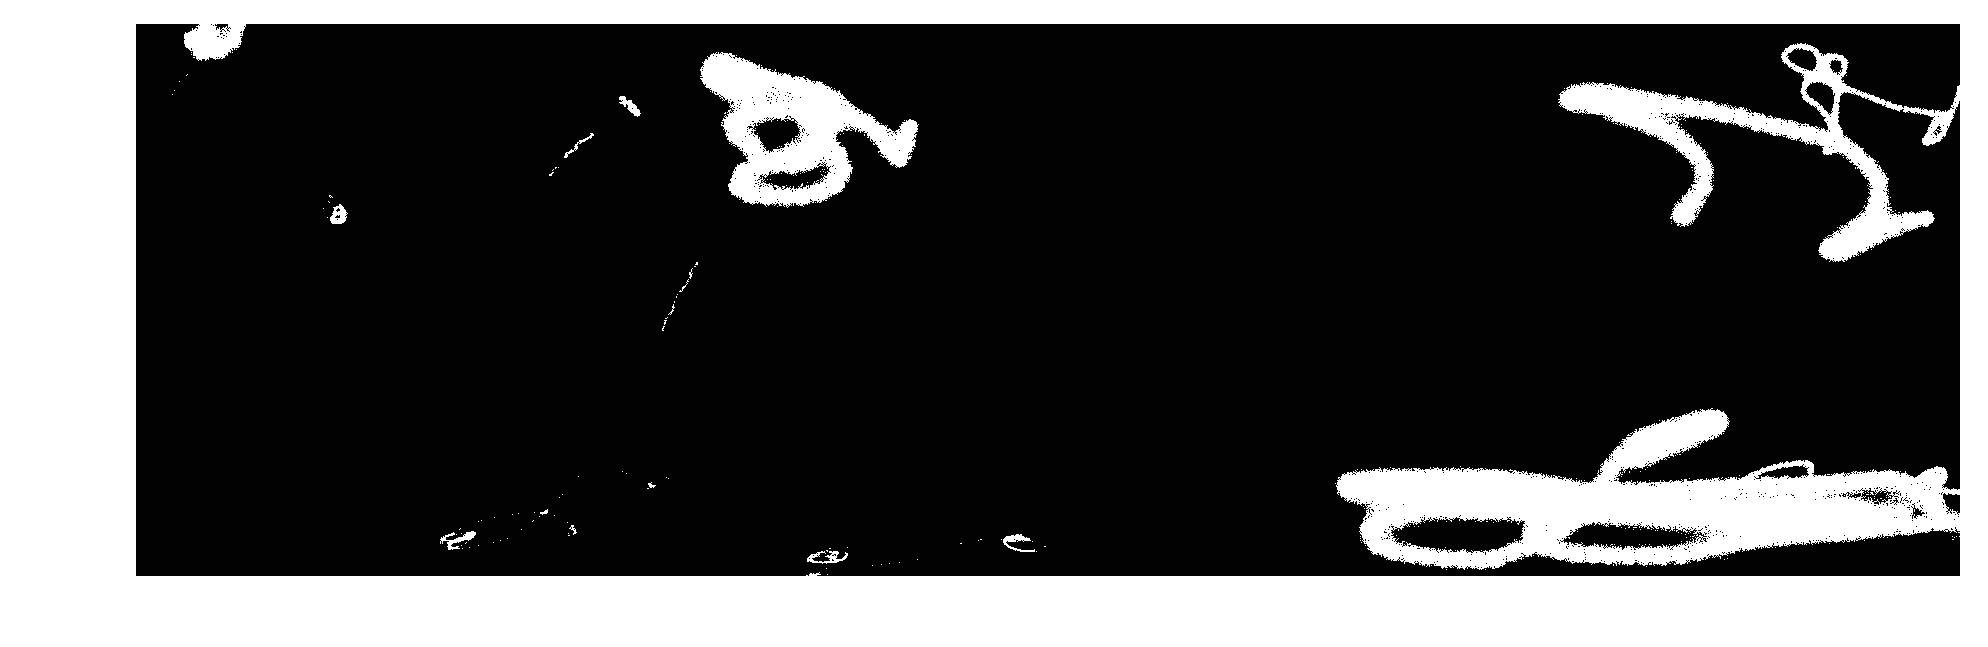 Awareness Gallery Signature